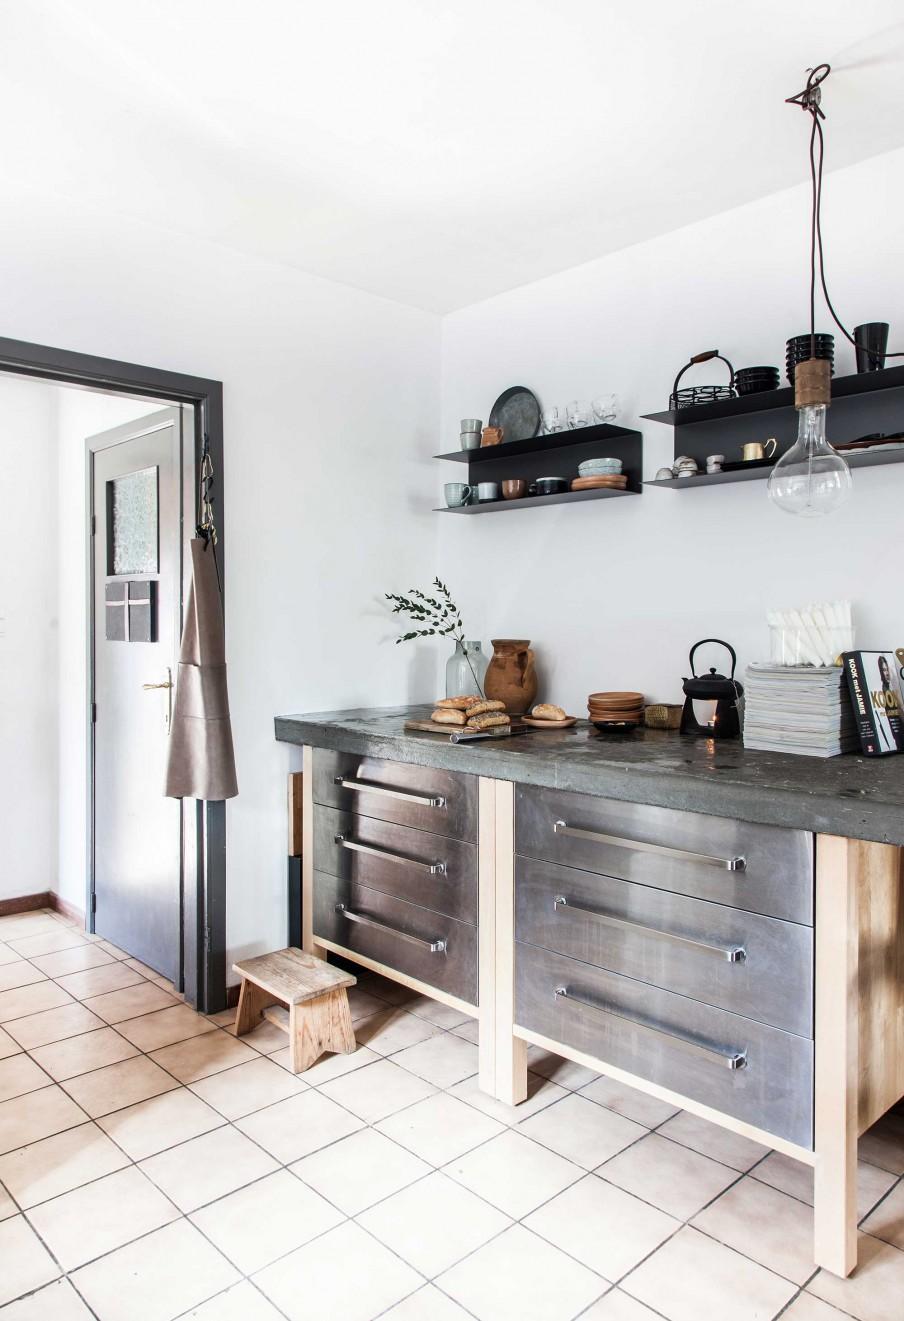 4-keuken-hout-metaal